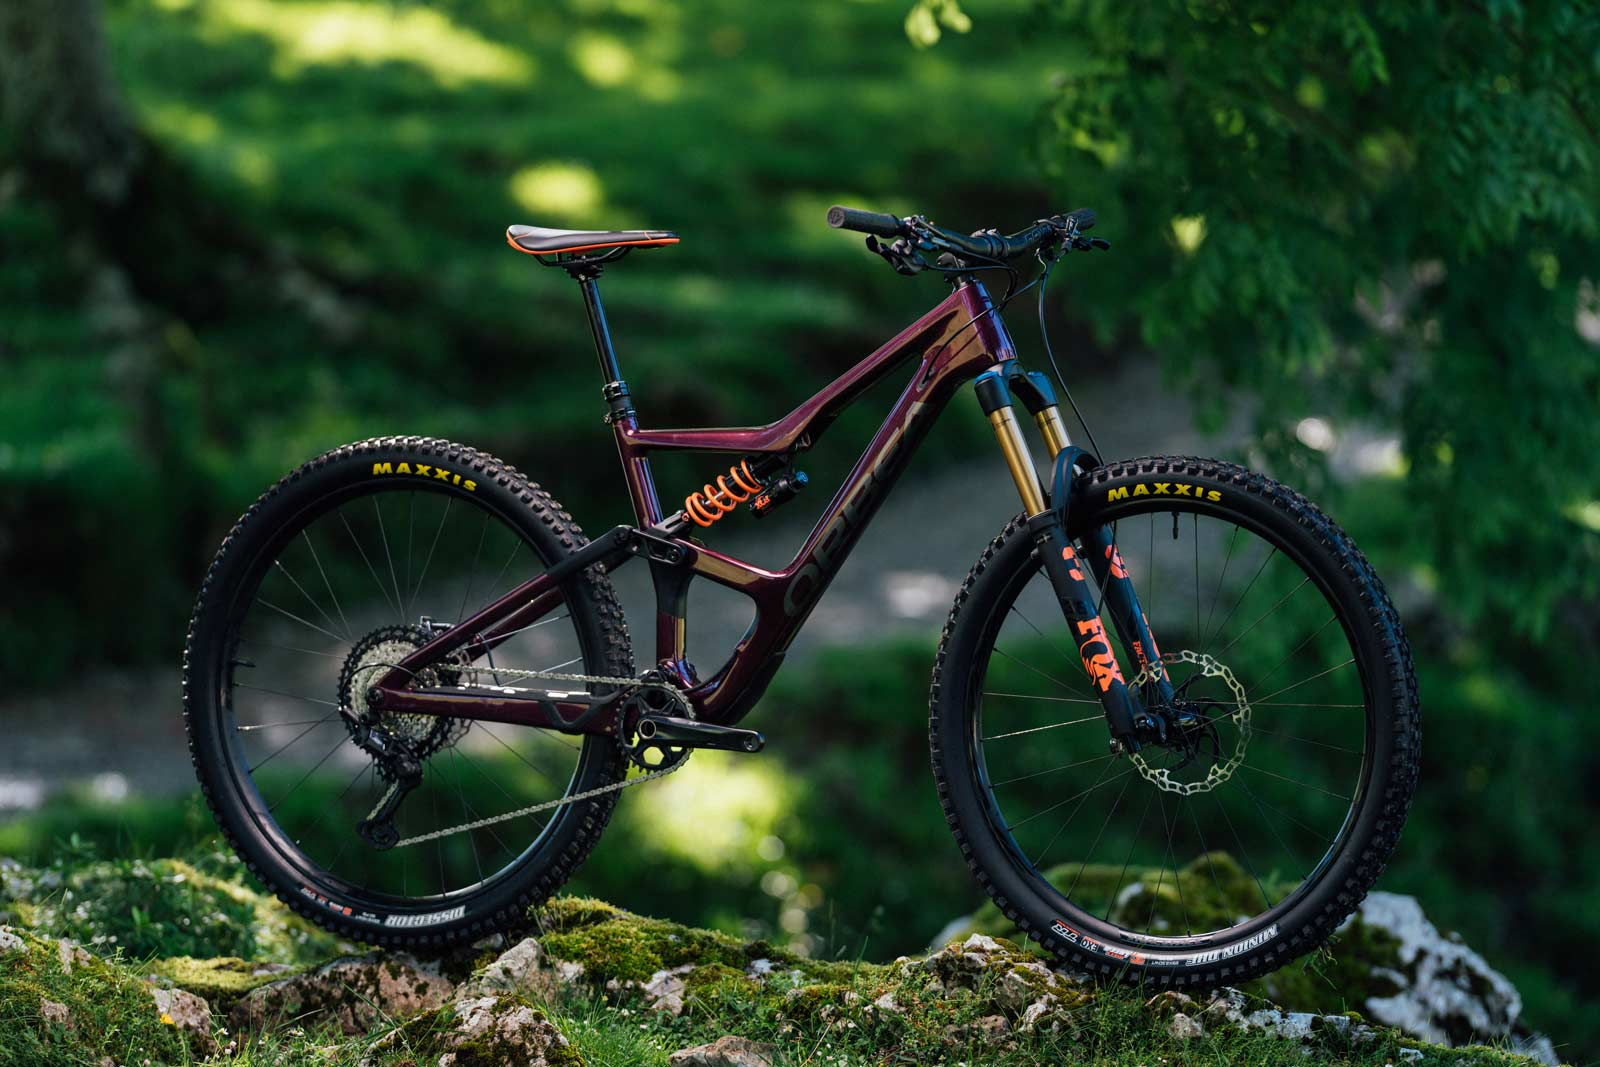 2022 orbea occam m 10 lt 150mm 29er trail bike purple fox dhx2 coil shock